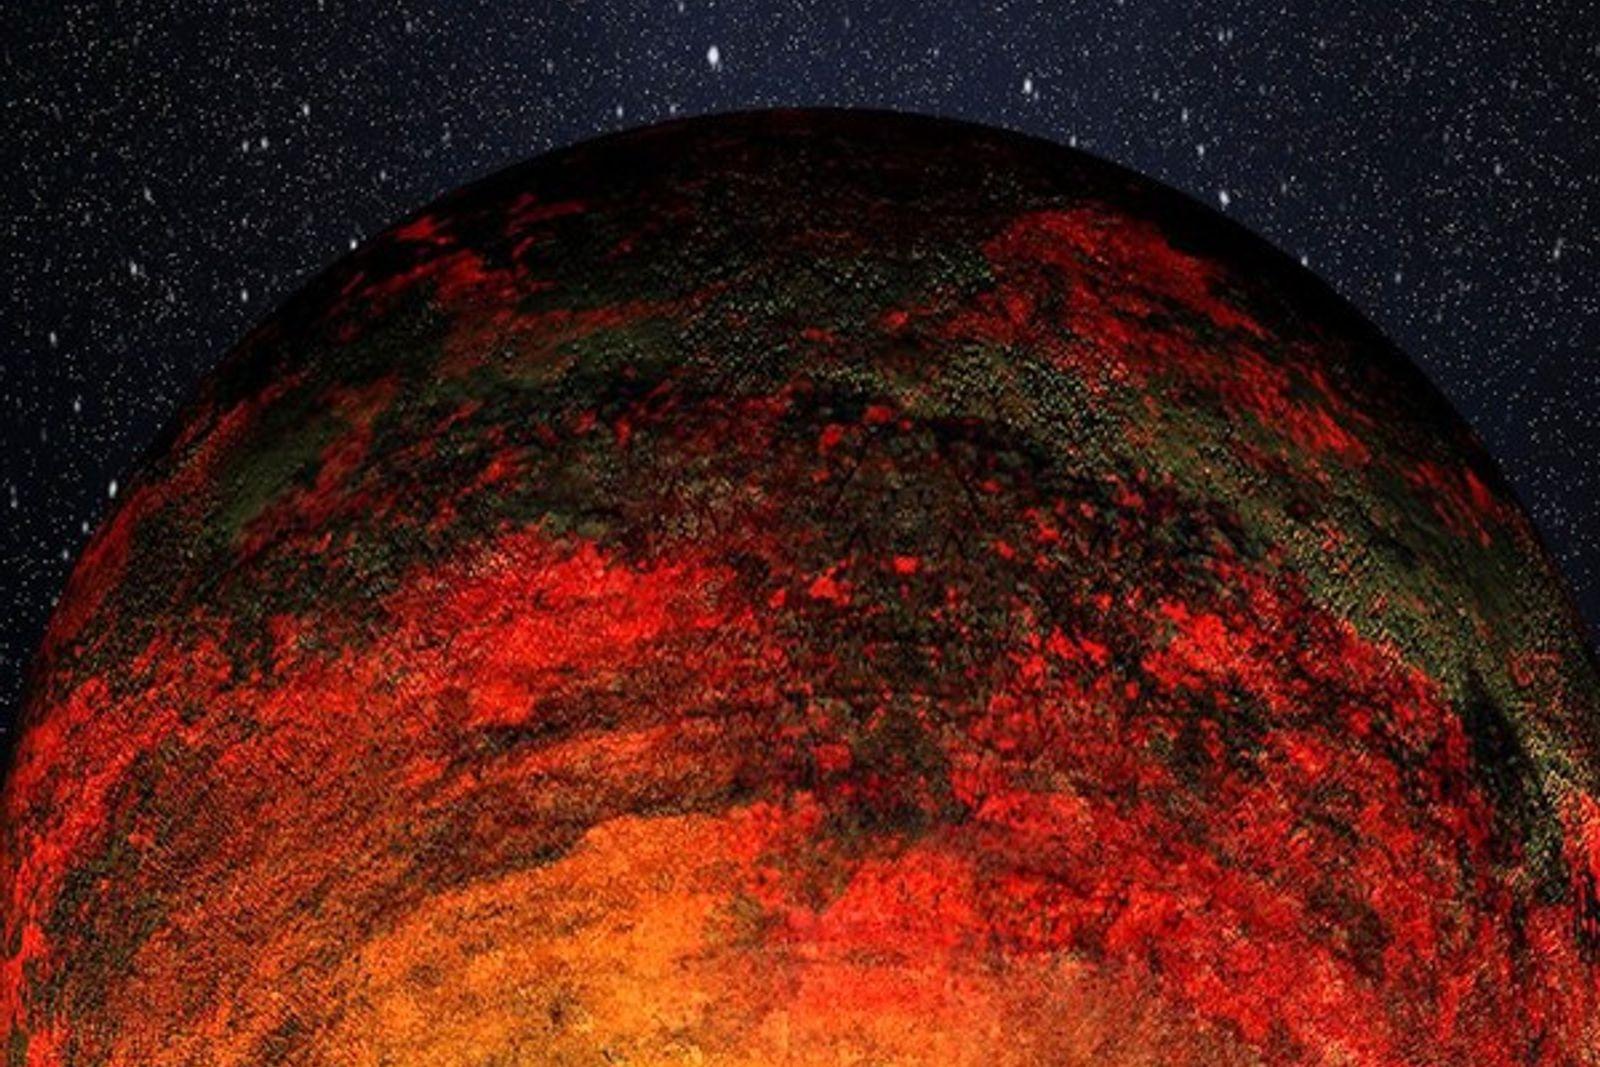 Se descubre un planeta similar a la Tierra